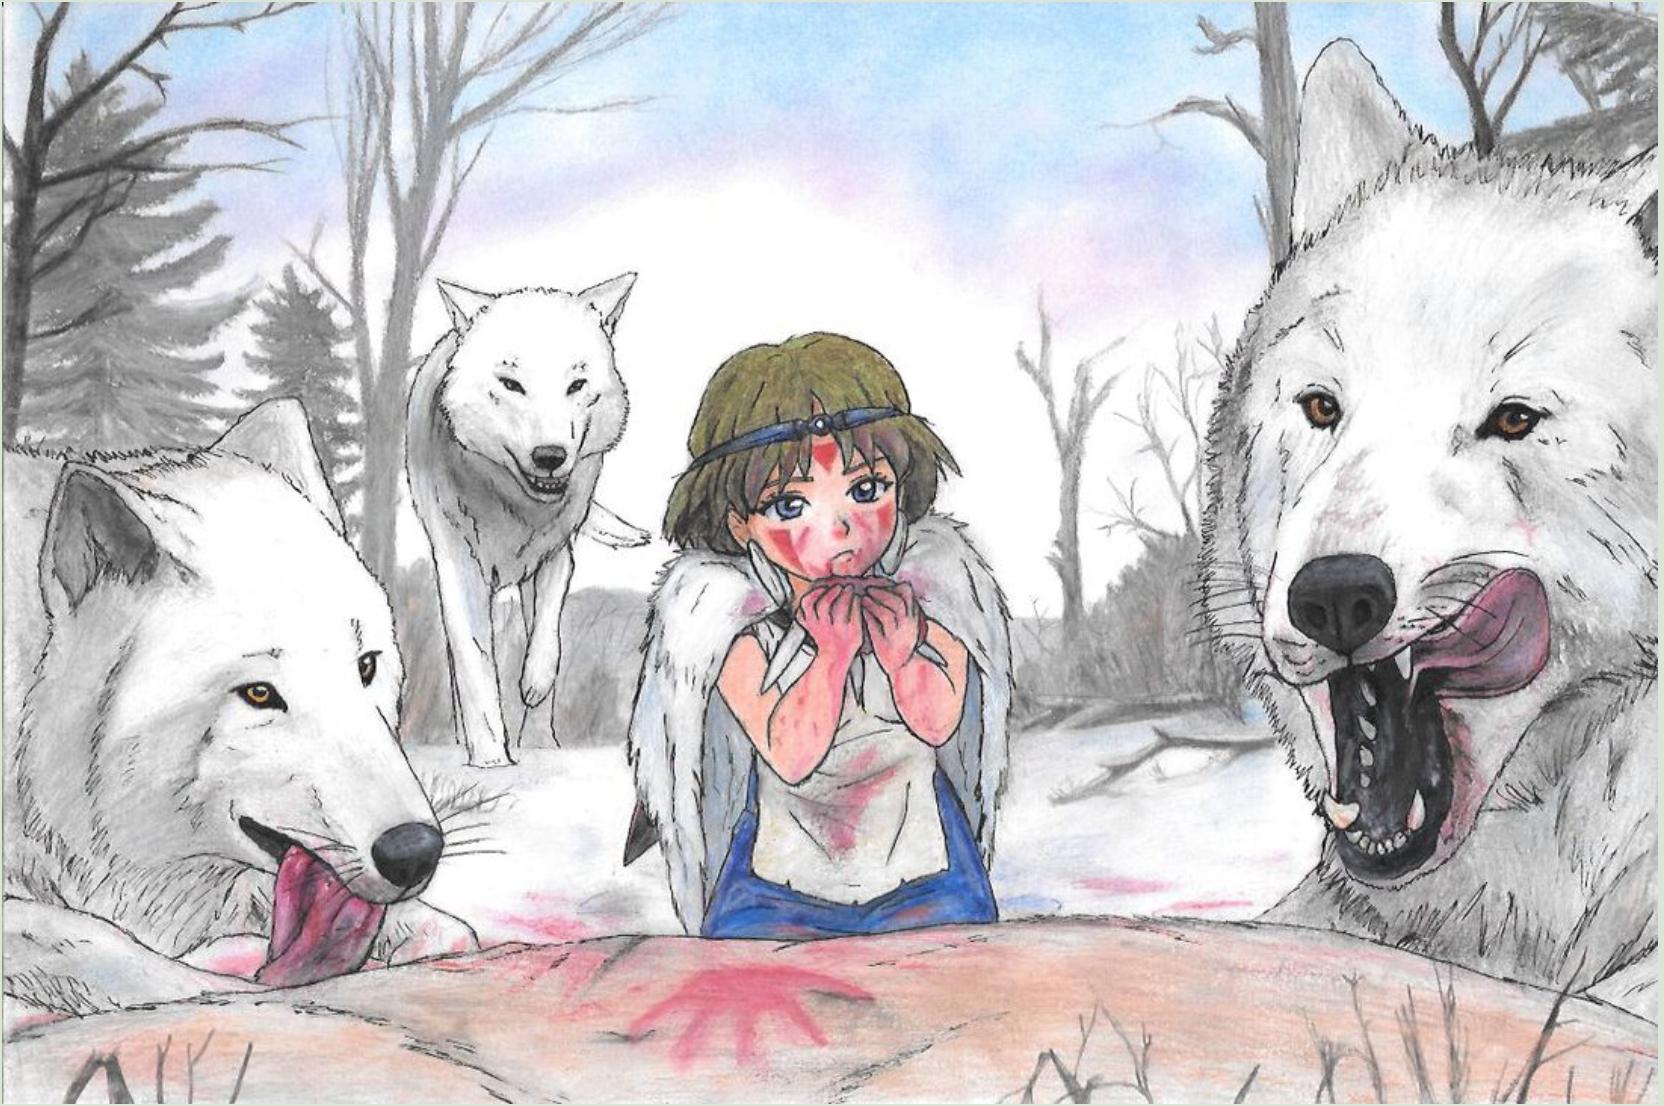 Princess Mononoke- San raised by her wolf family